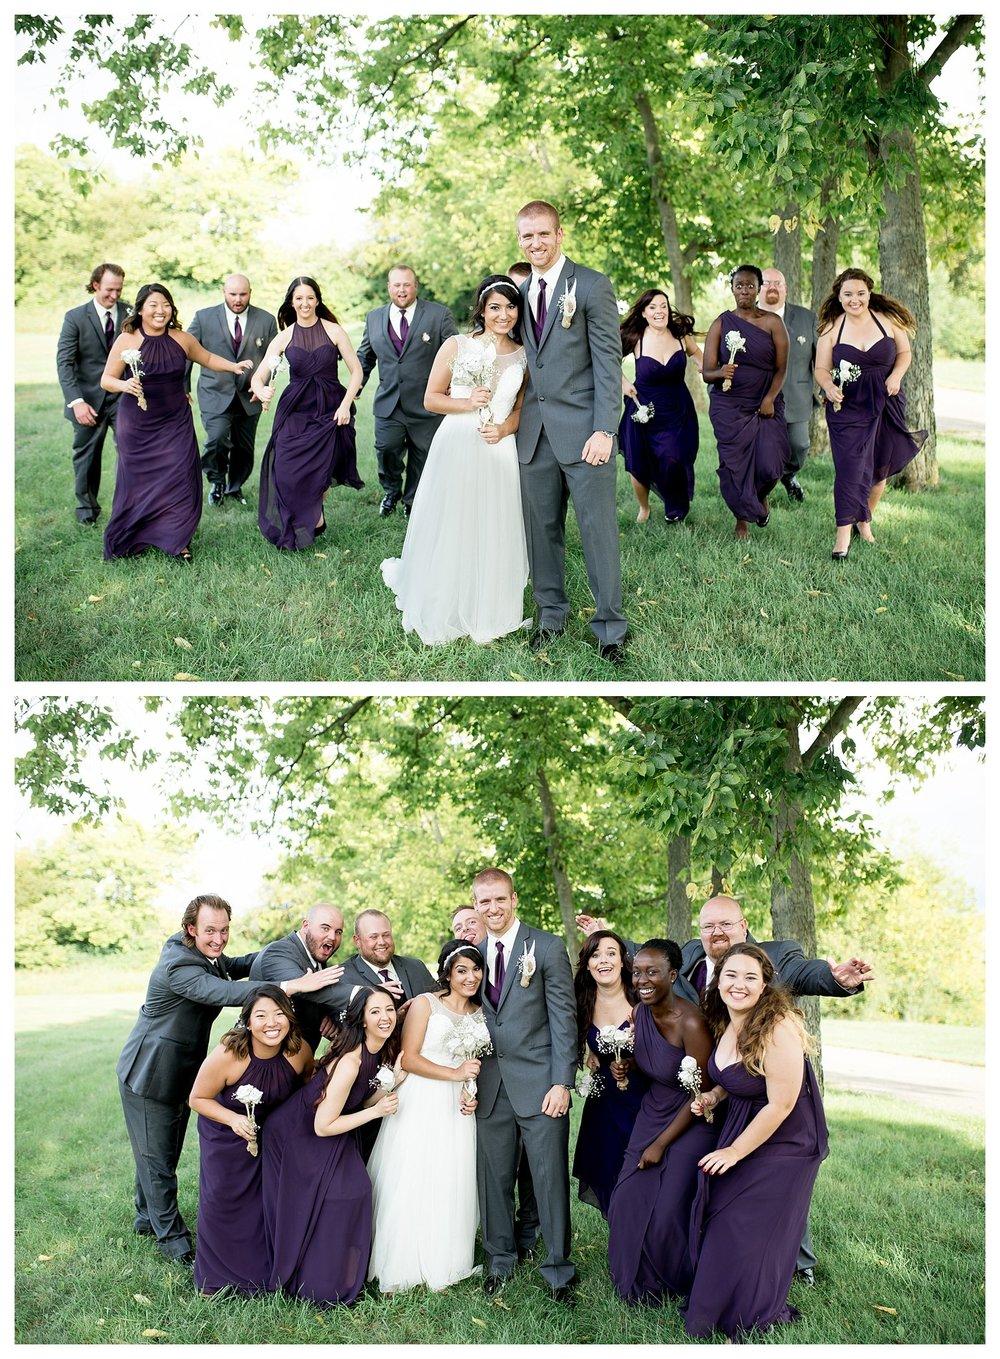 everleigh-photography-cincinnati-wedding-photographer-lake-lyndsay-wedding-hamilton-ohio_20